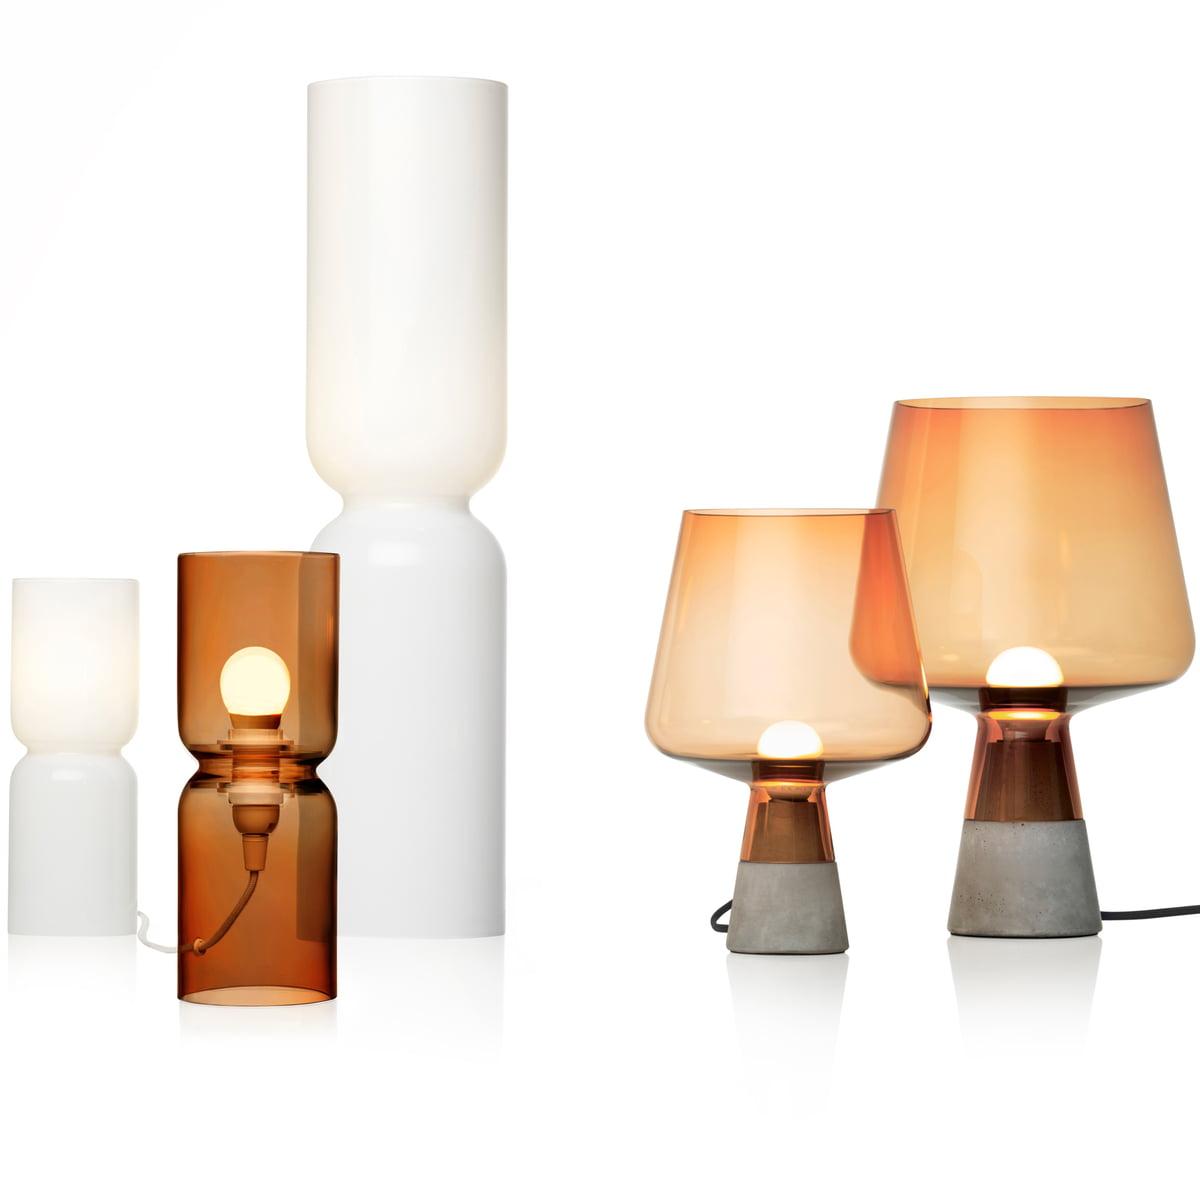 Lampe Mm LanternBlanc Lampe 250 Iittala Iittala hdCtsrQx